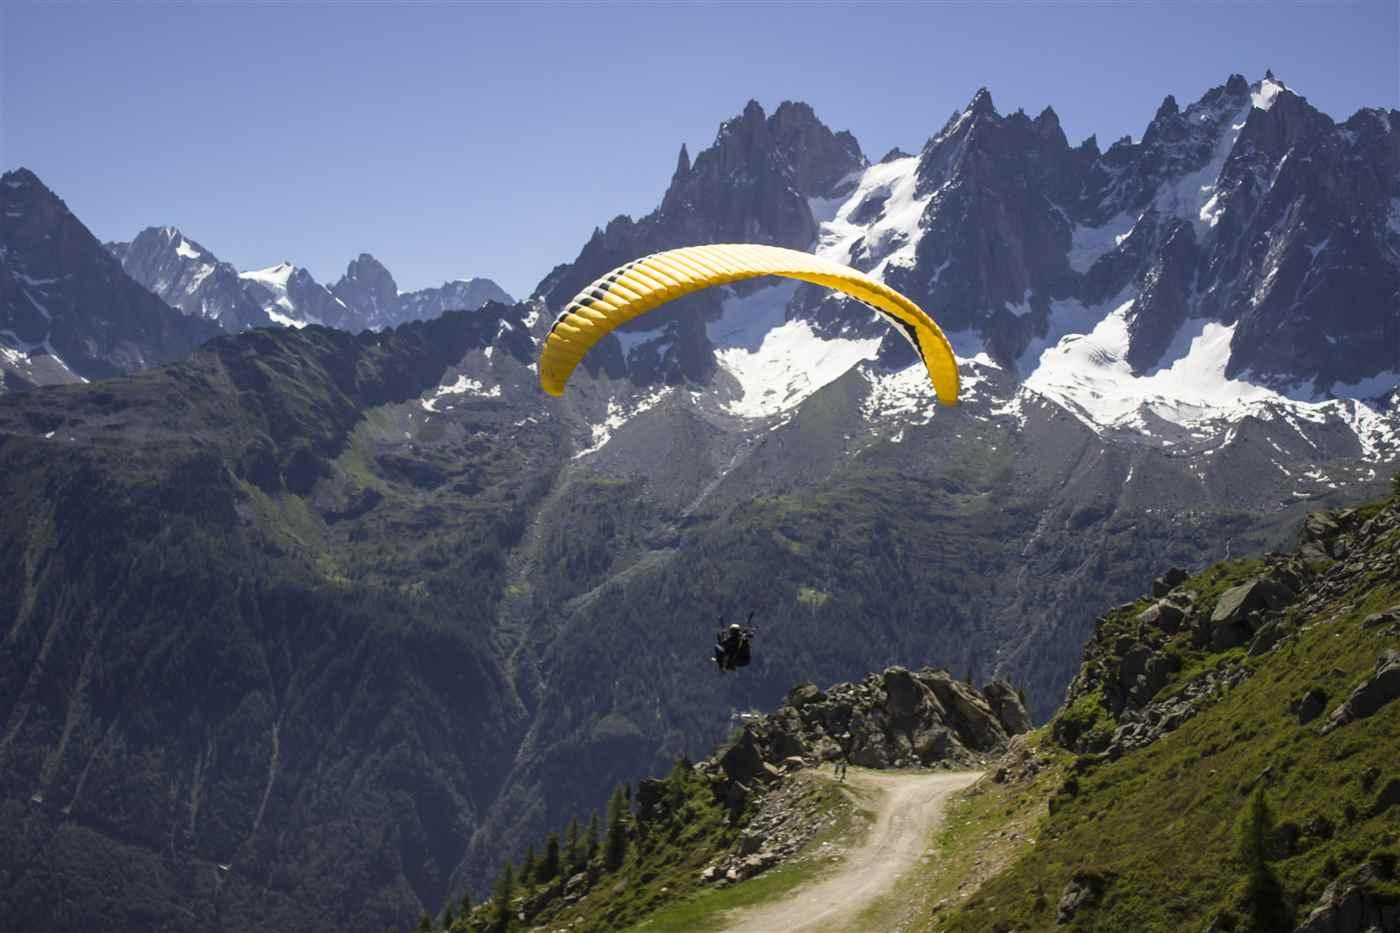 paragliding-mountains-sport-paraglider-163228